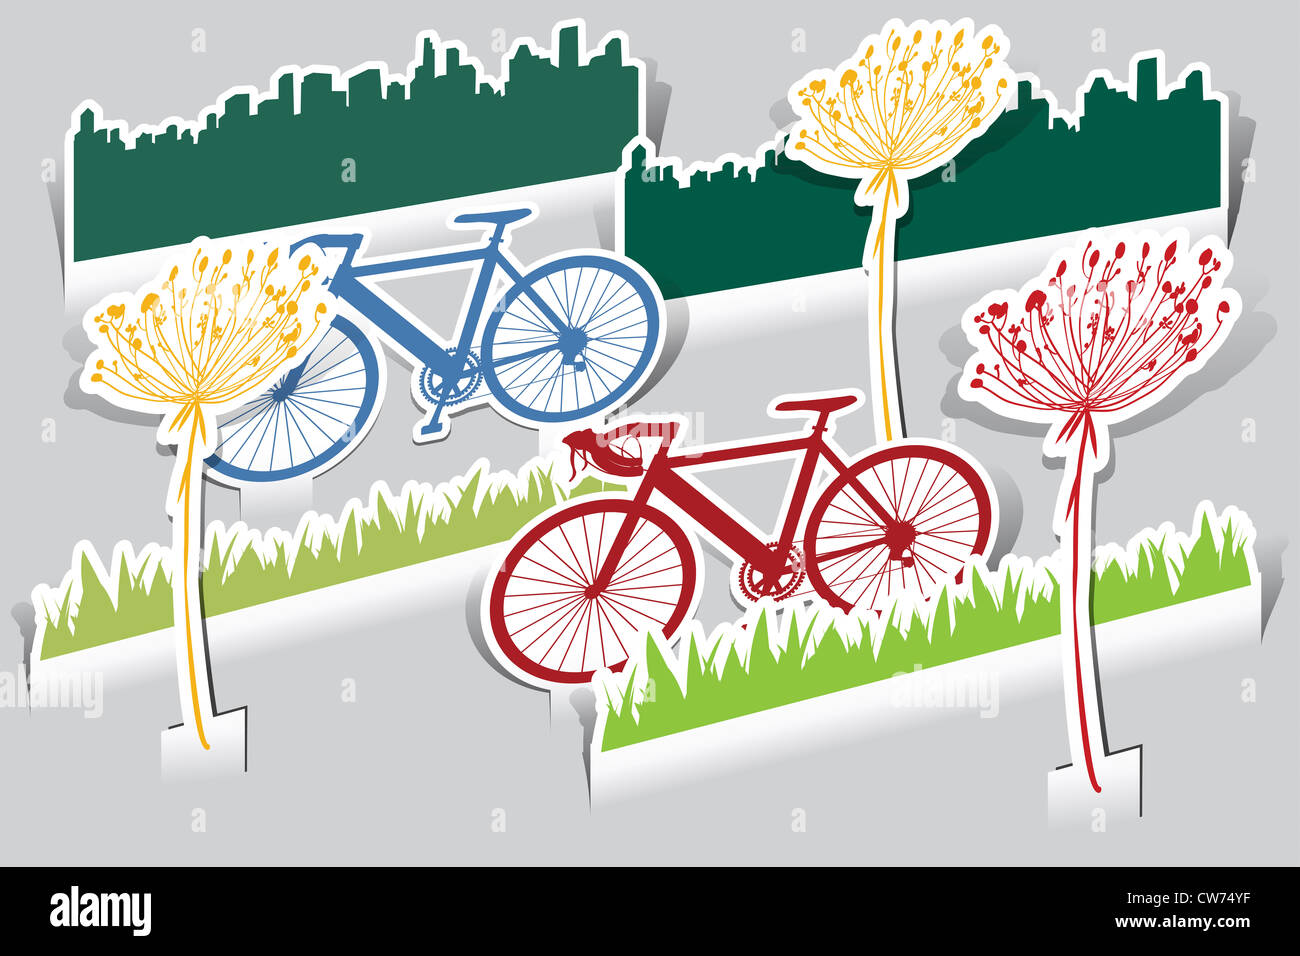 set of paper cut bike, grass,bike, grass, flower icon - Stock Image